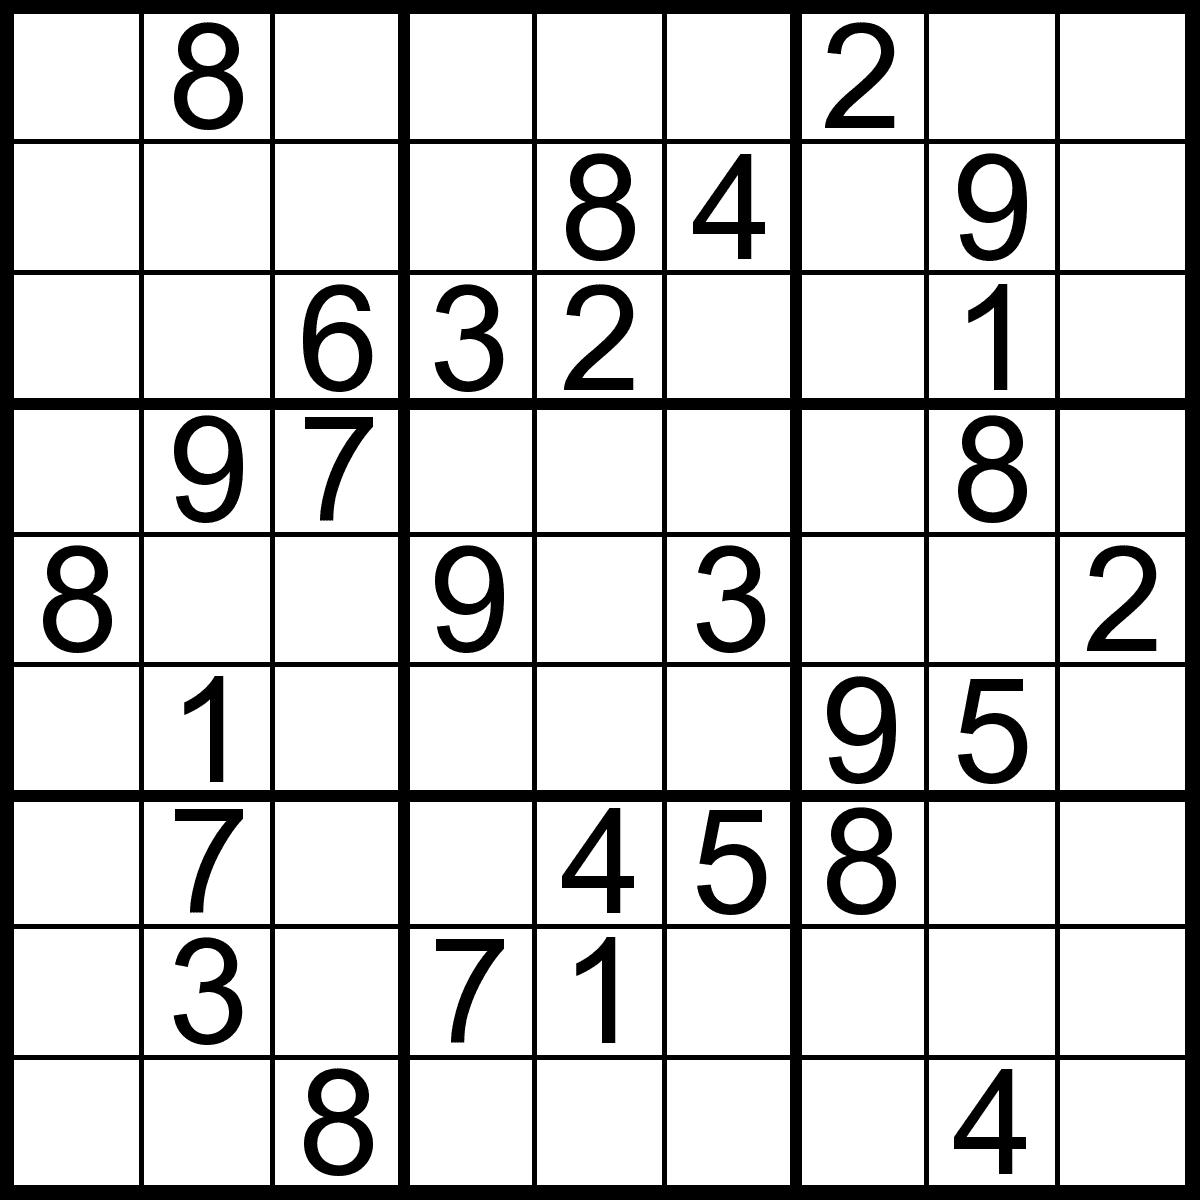 Free Sudoku Puzzles Image